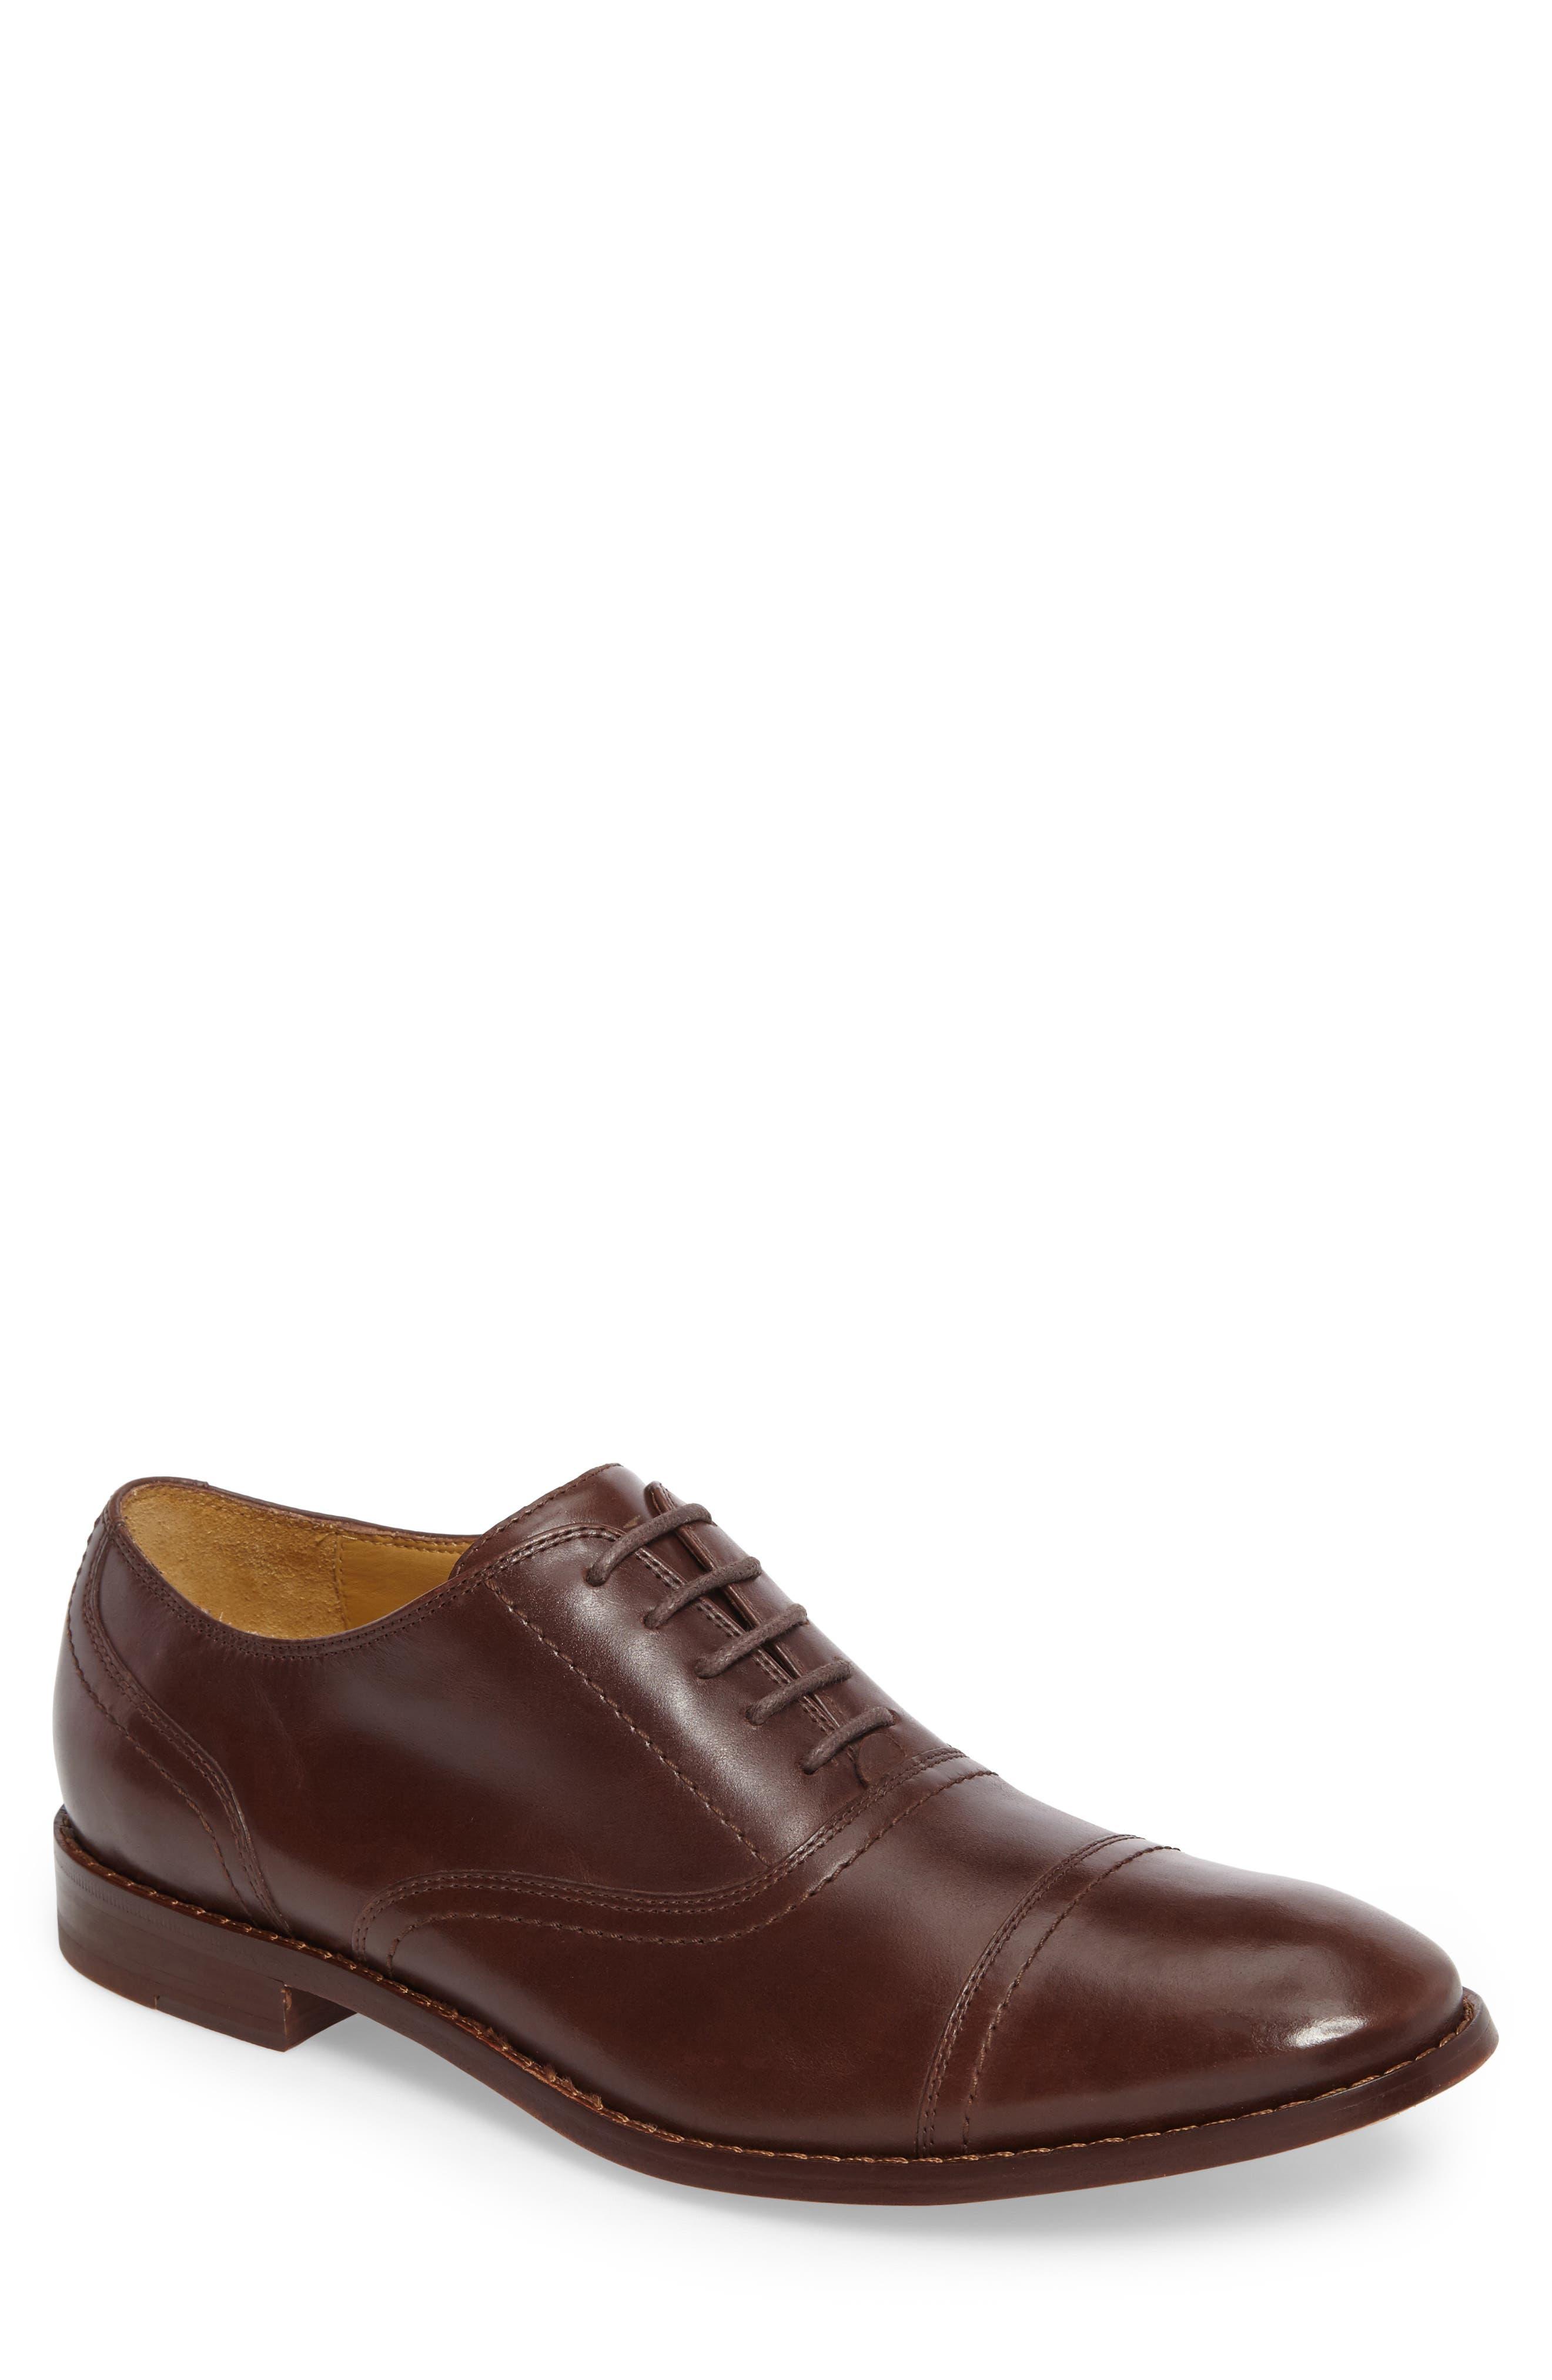 Caan Cap Toe Oxford,                         Main,                         color, 206